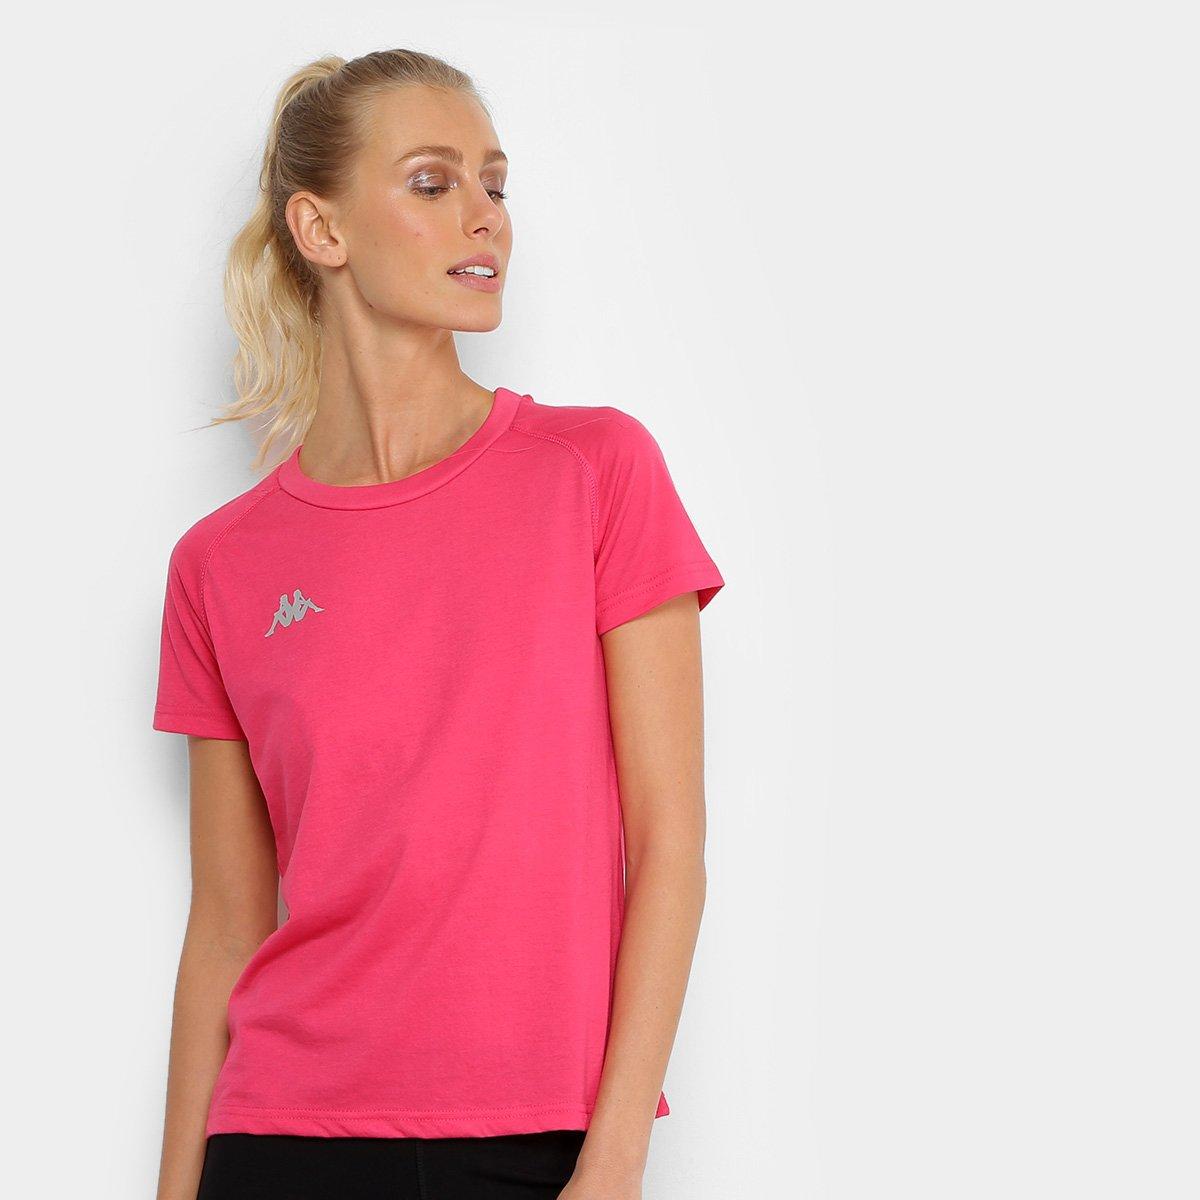 Kappa e Feminina Preto Verona Rosa Camiseta Verona Camiseta Kappa zwgqStx